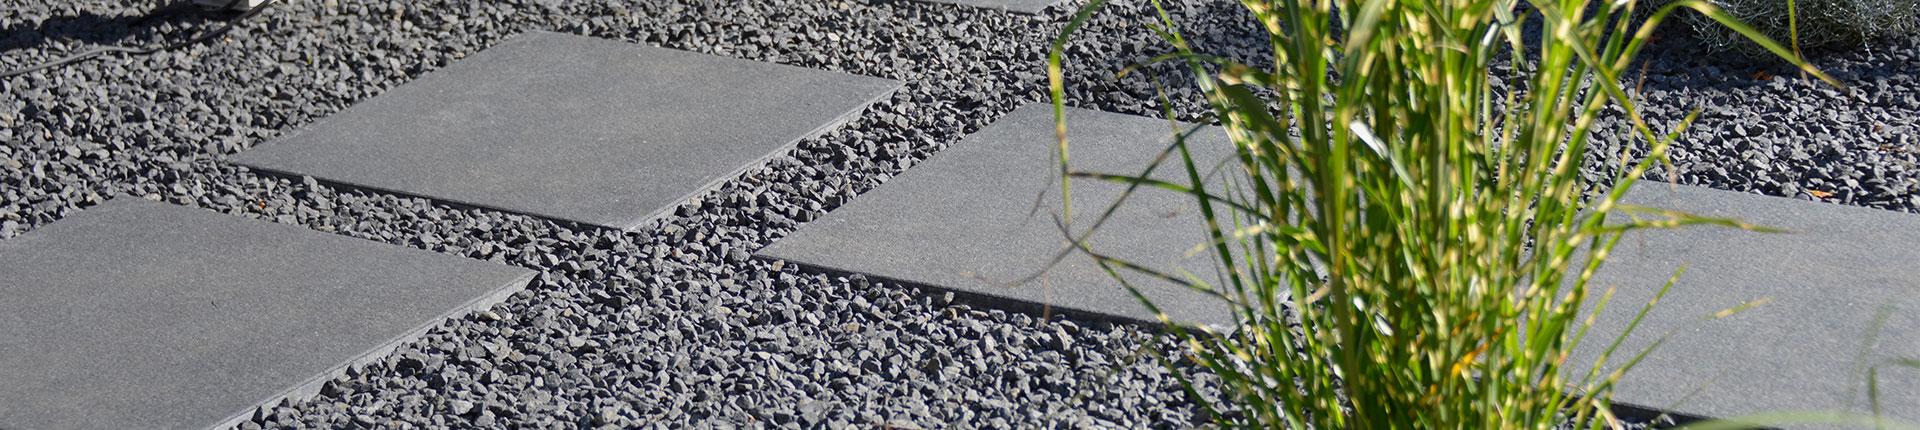 Terrassenbelaege_Braunbeton2_1920x430